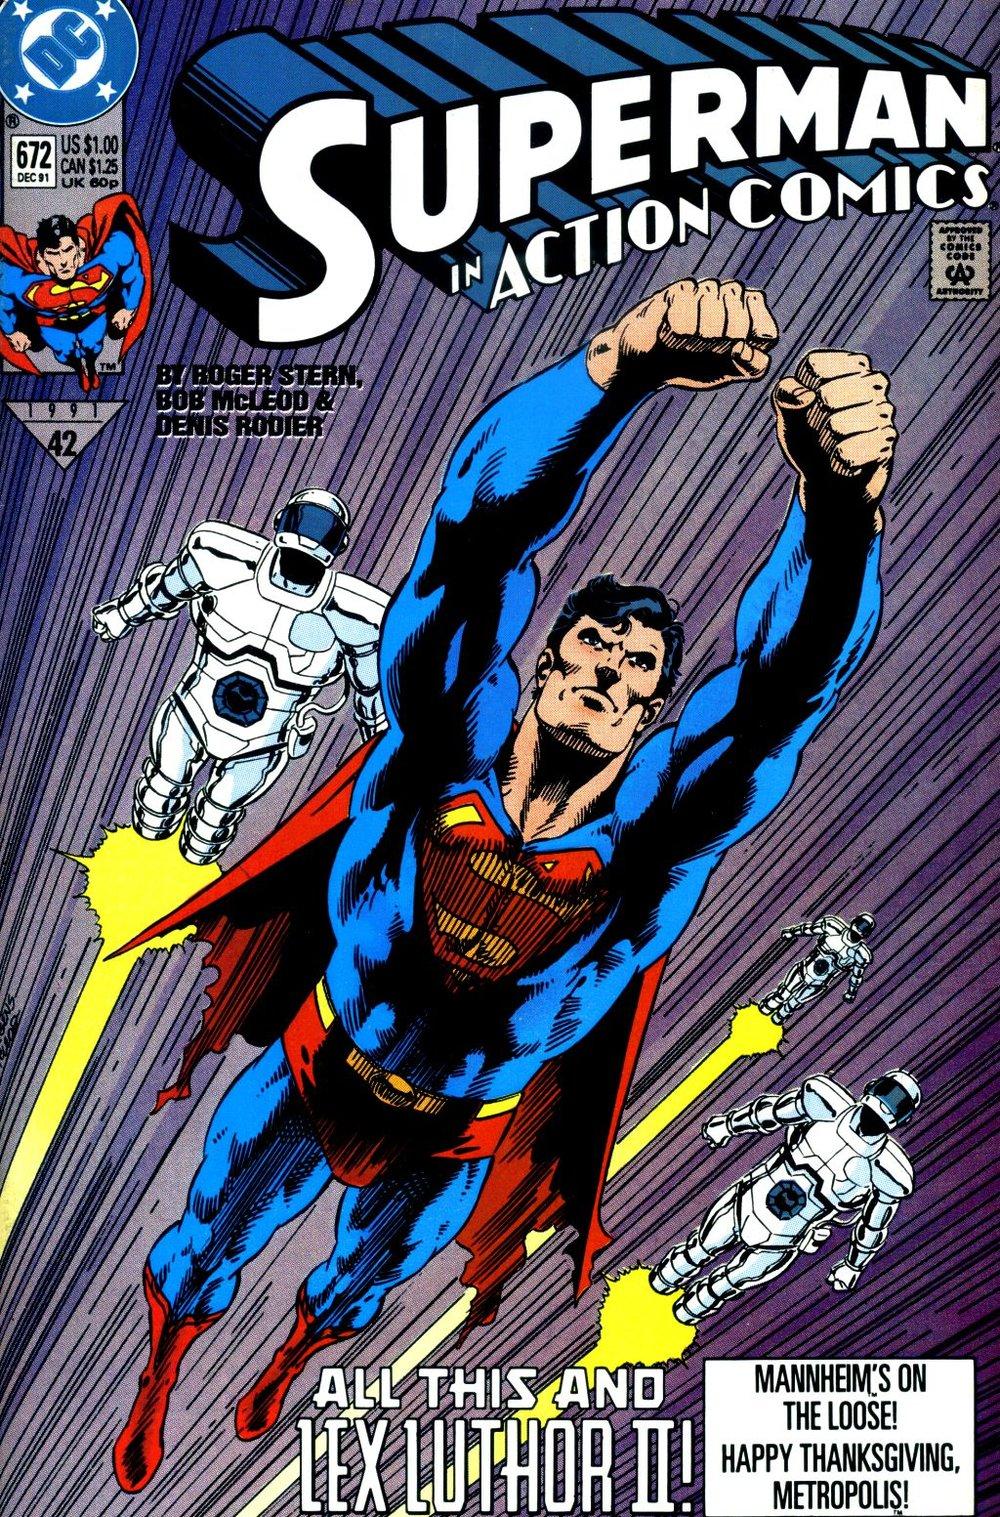 Action Comics (1938) #672, cover penciled by Dan Jurgens & inked by Bob McLeod.